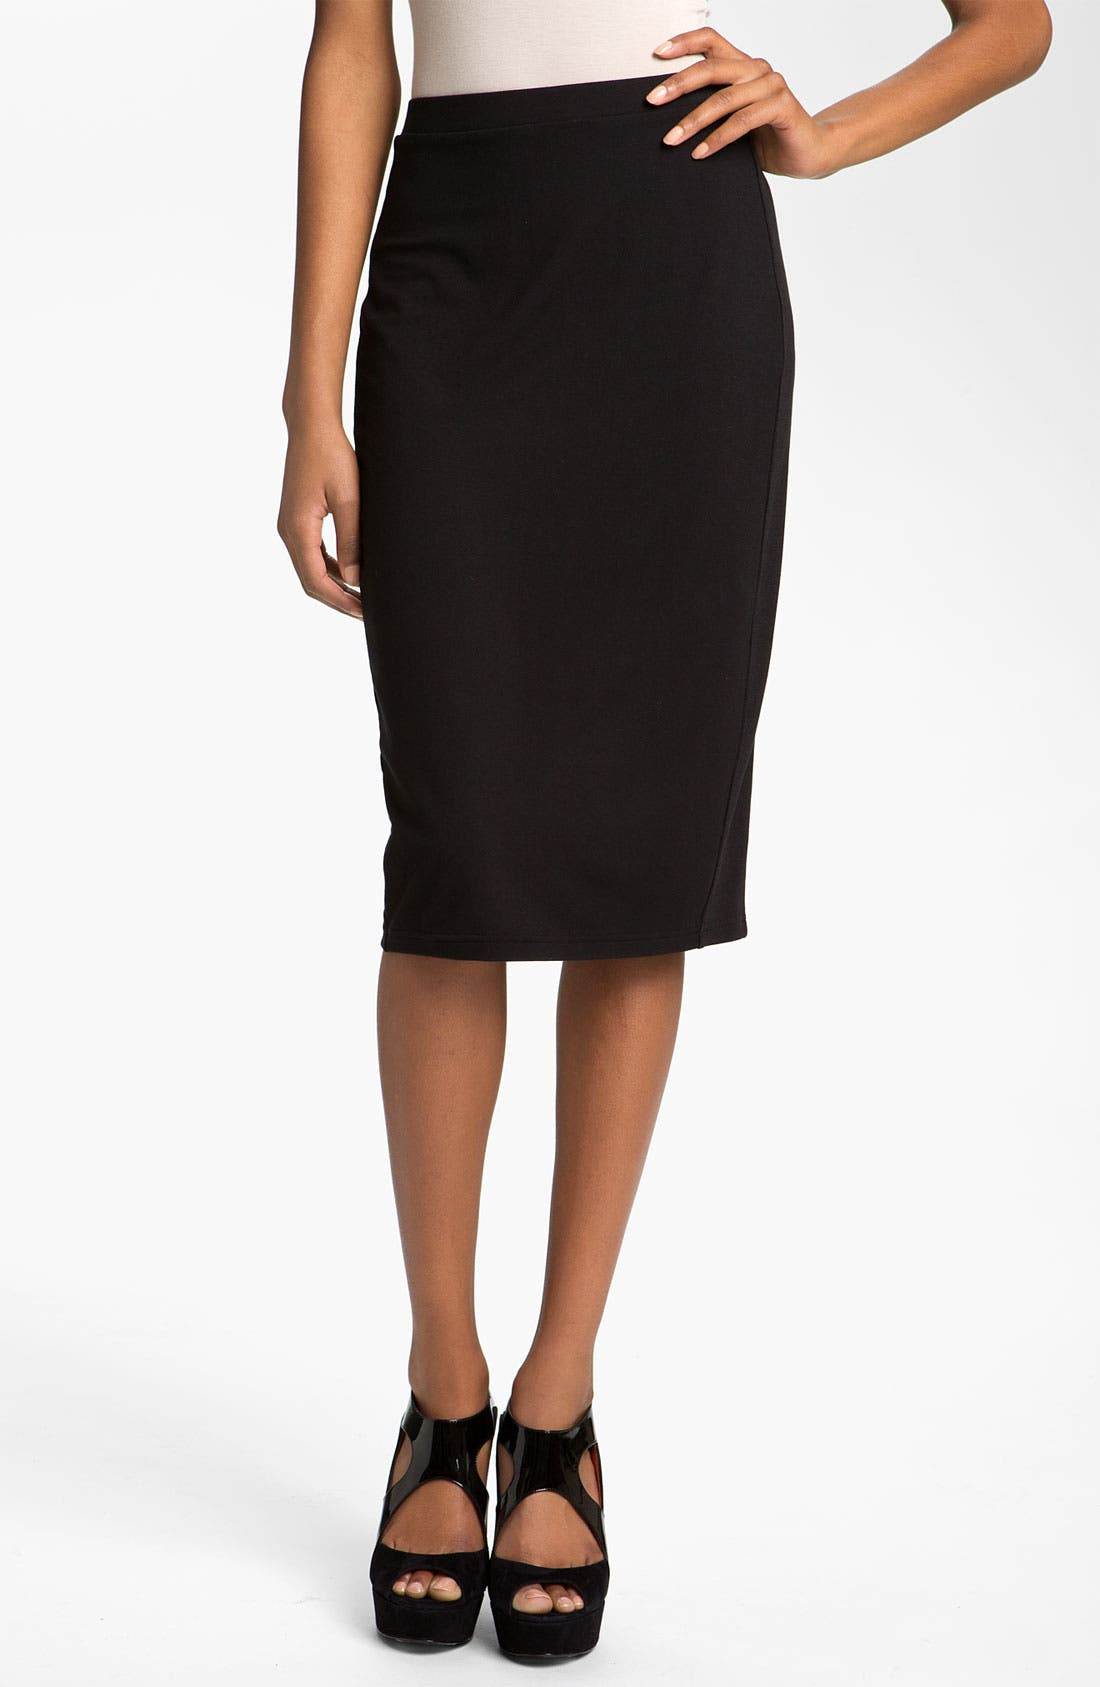 Alternate Image 1 Selected - Trouvé Rib Panel Pencil Skirt